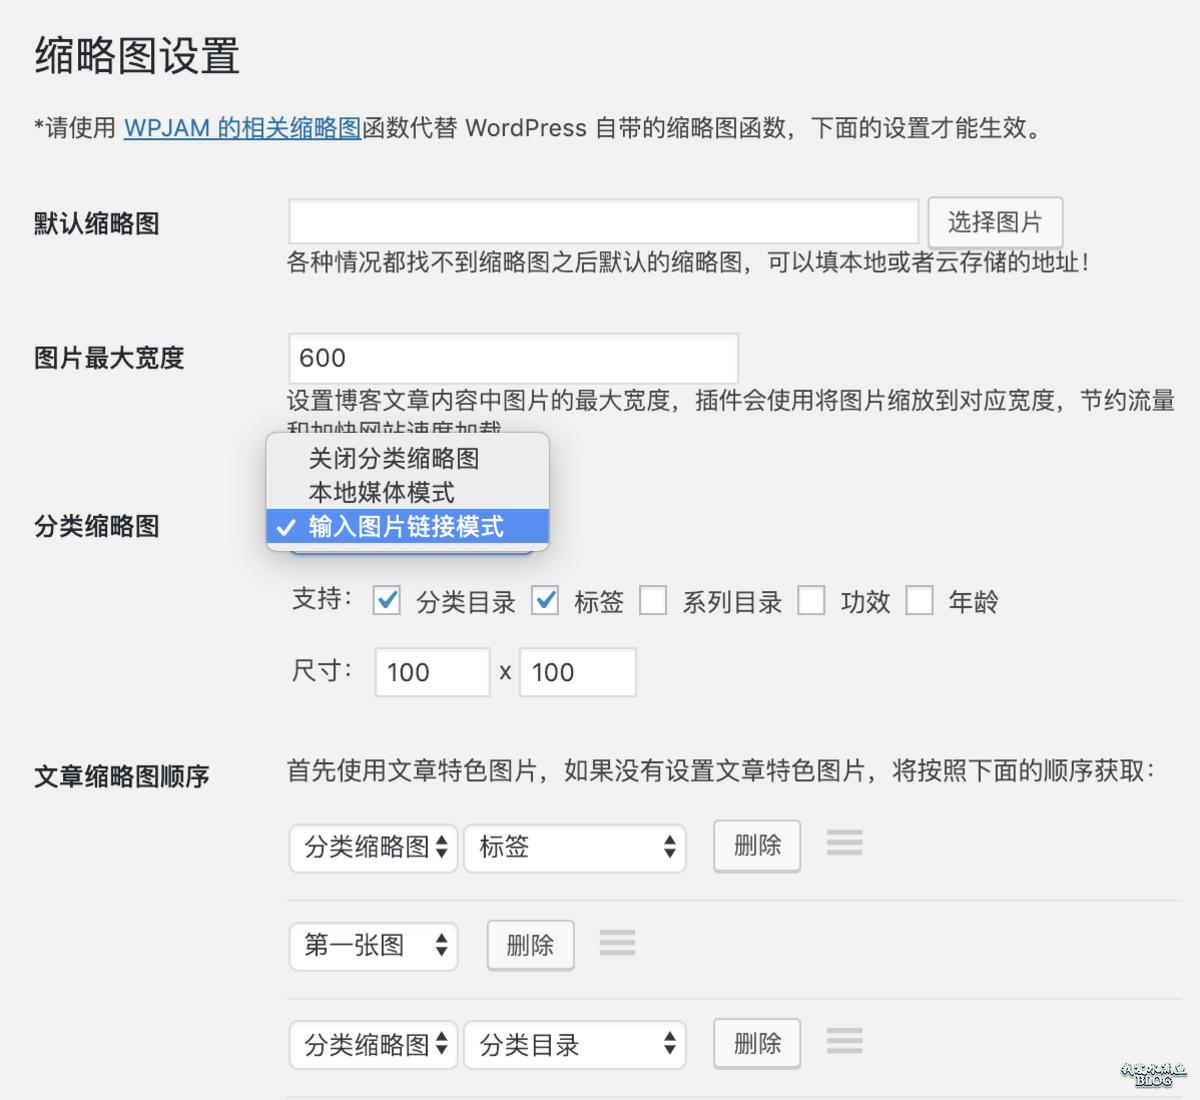 WPJAM Basic - 缩略图设置